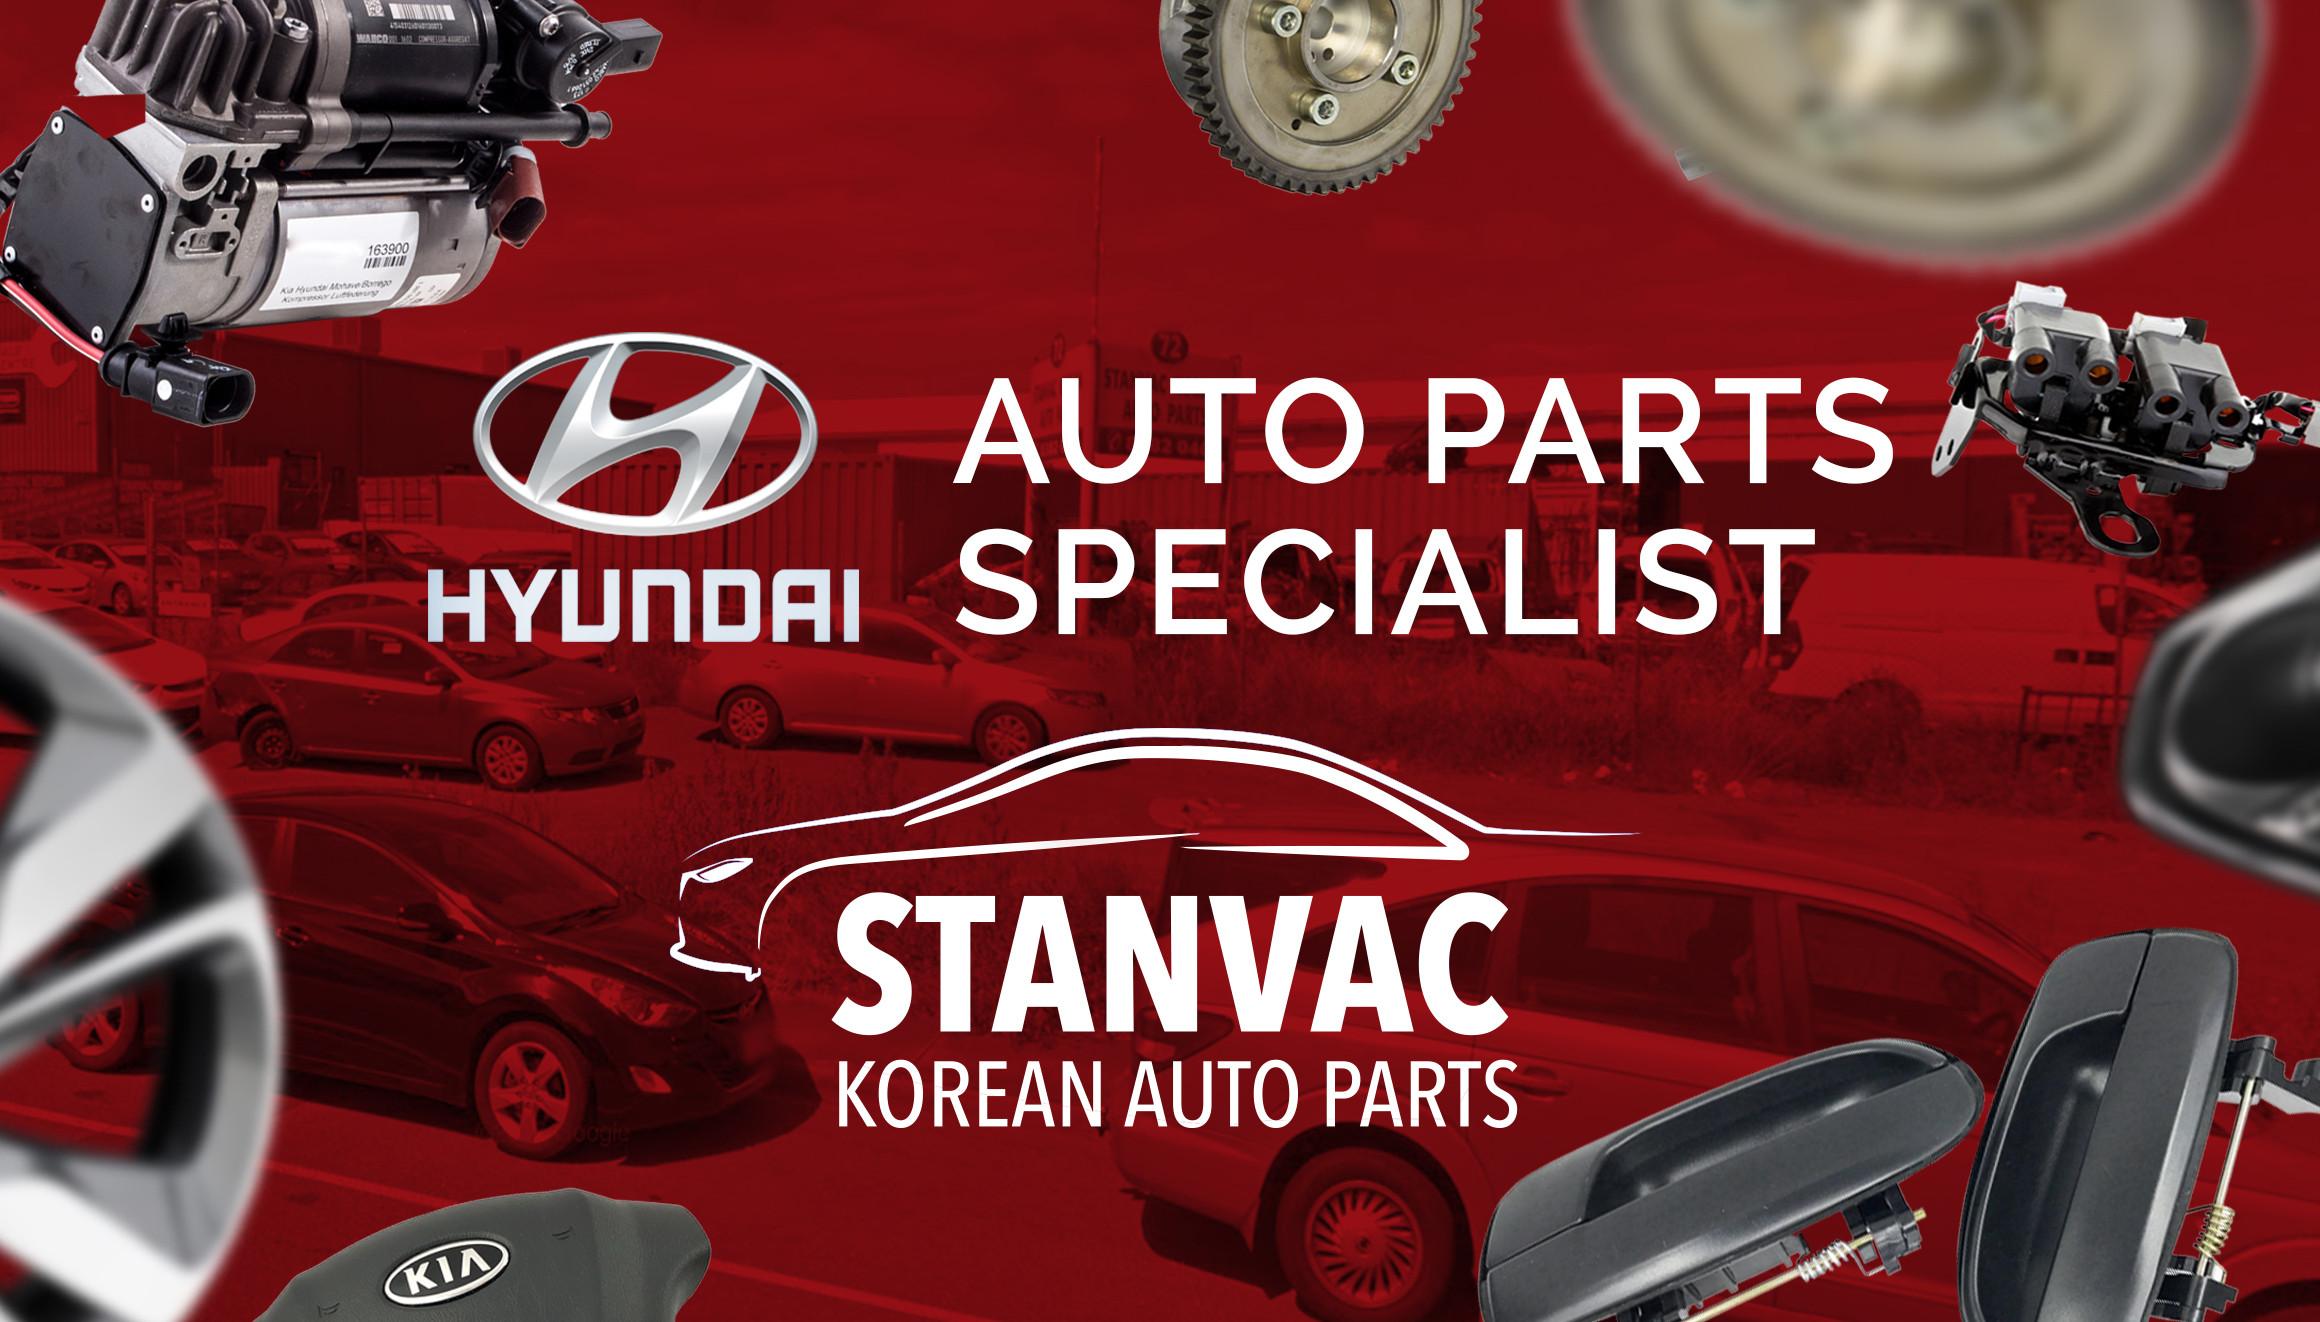 HYUNDAI | Stanvac Korean Auto Parts | Lonsdale SA